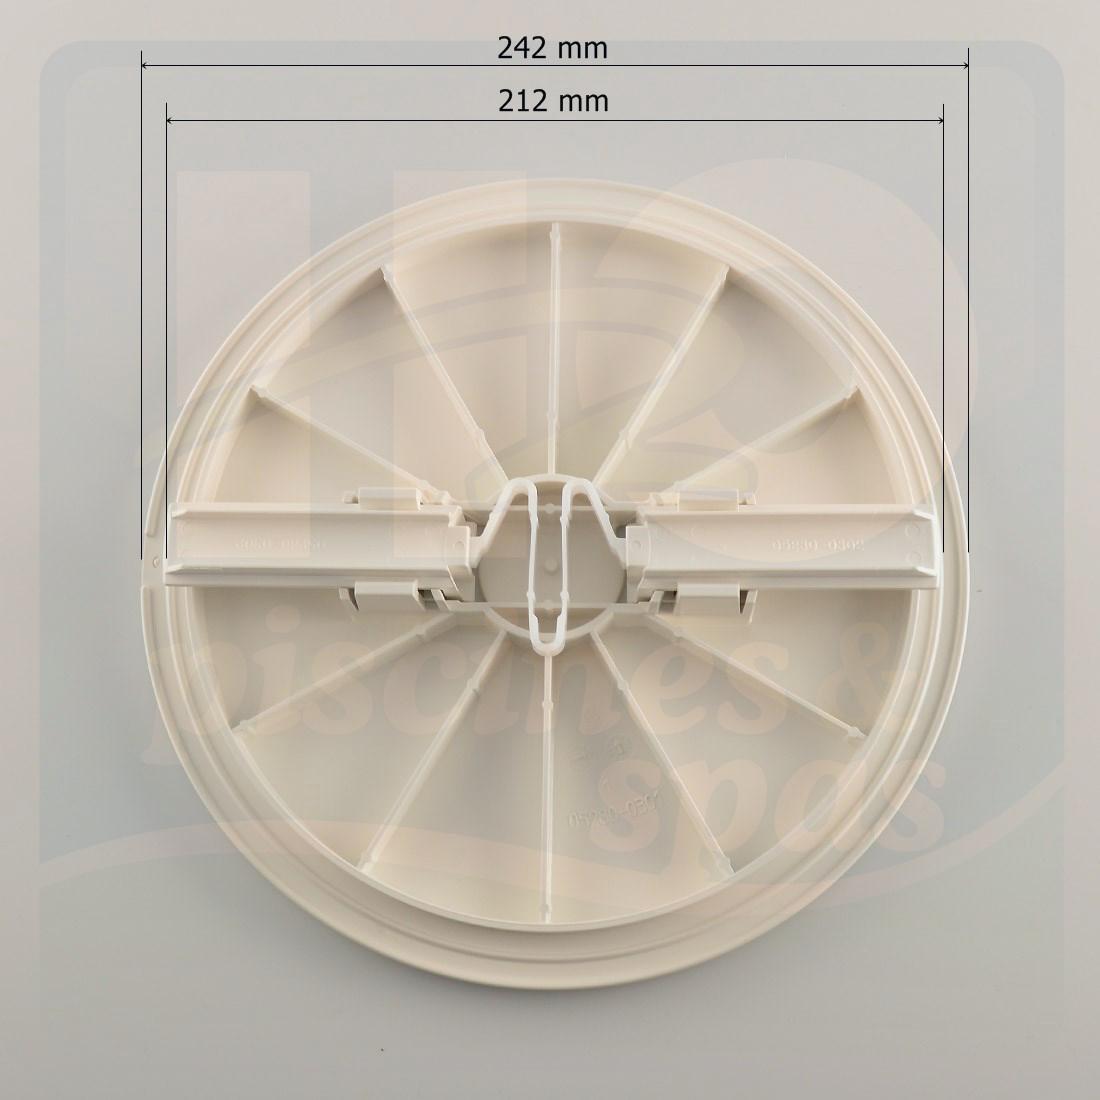 Couvercle Rond De Skimmer Astral Pour Piscine Béton H2o Piscines Spas